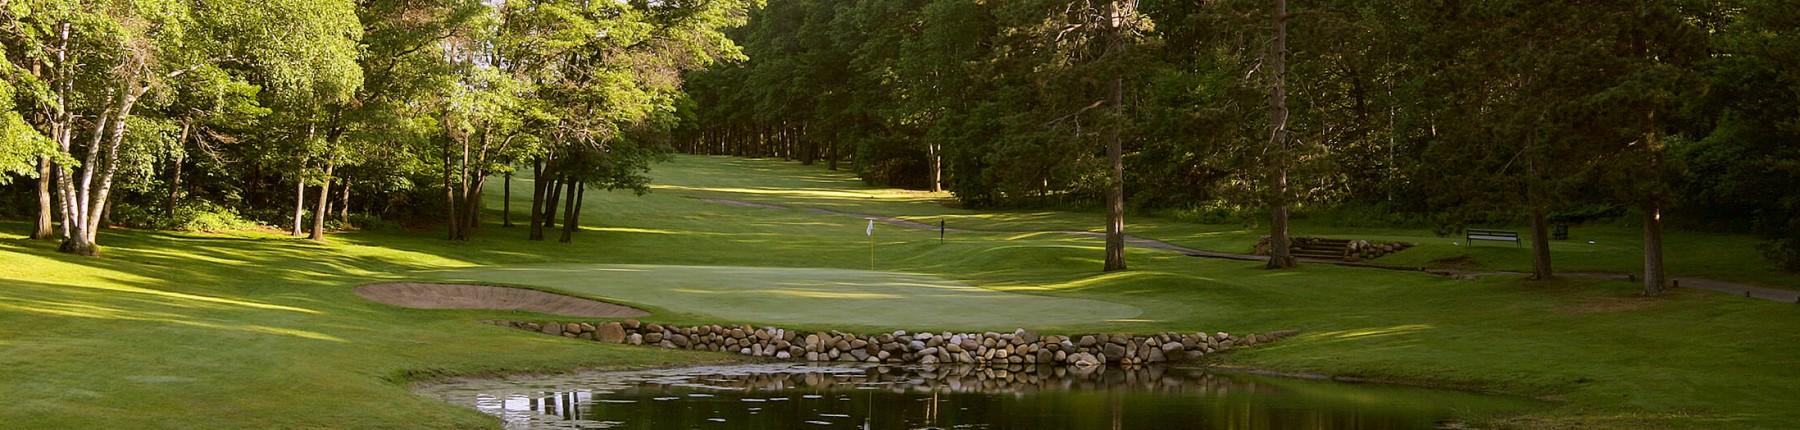 classic-golf-deluxe